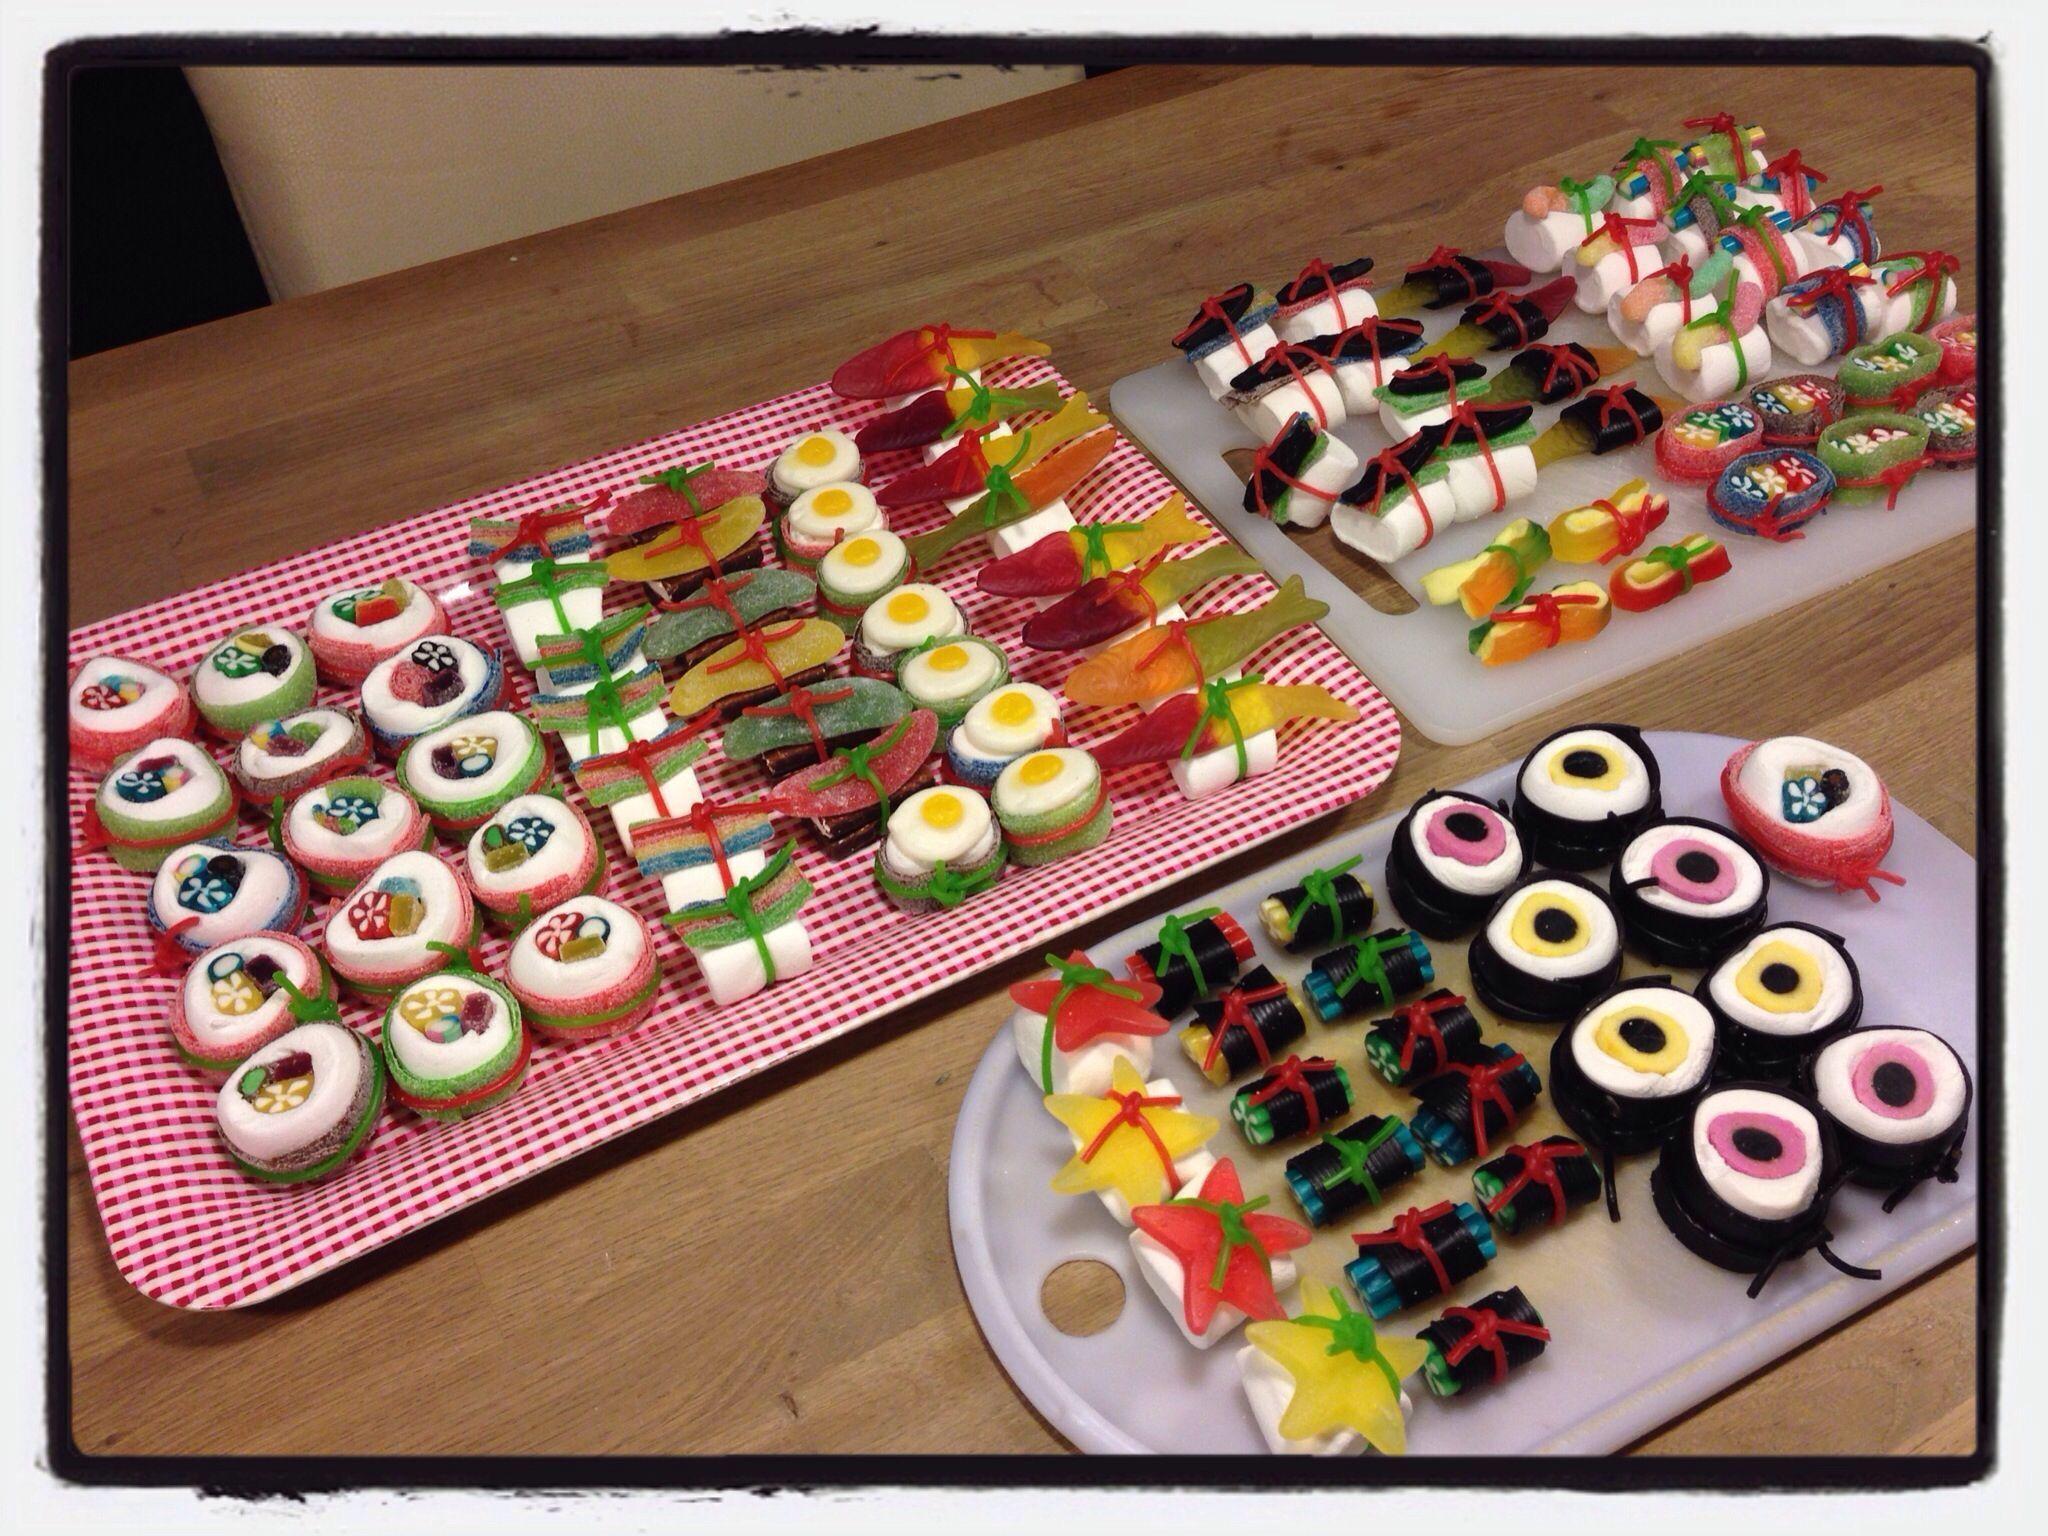 Snoep sushi/Candy sushi #candysushi Snoep sushi/Candy sushi #candysushi Snoep sushi/Candy sushi #candysushi Snoep sushi/Candy sushi #candysushi